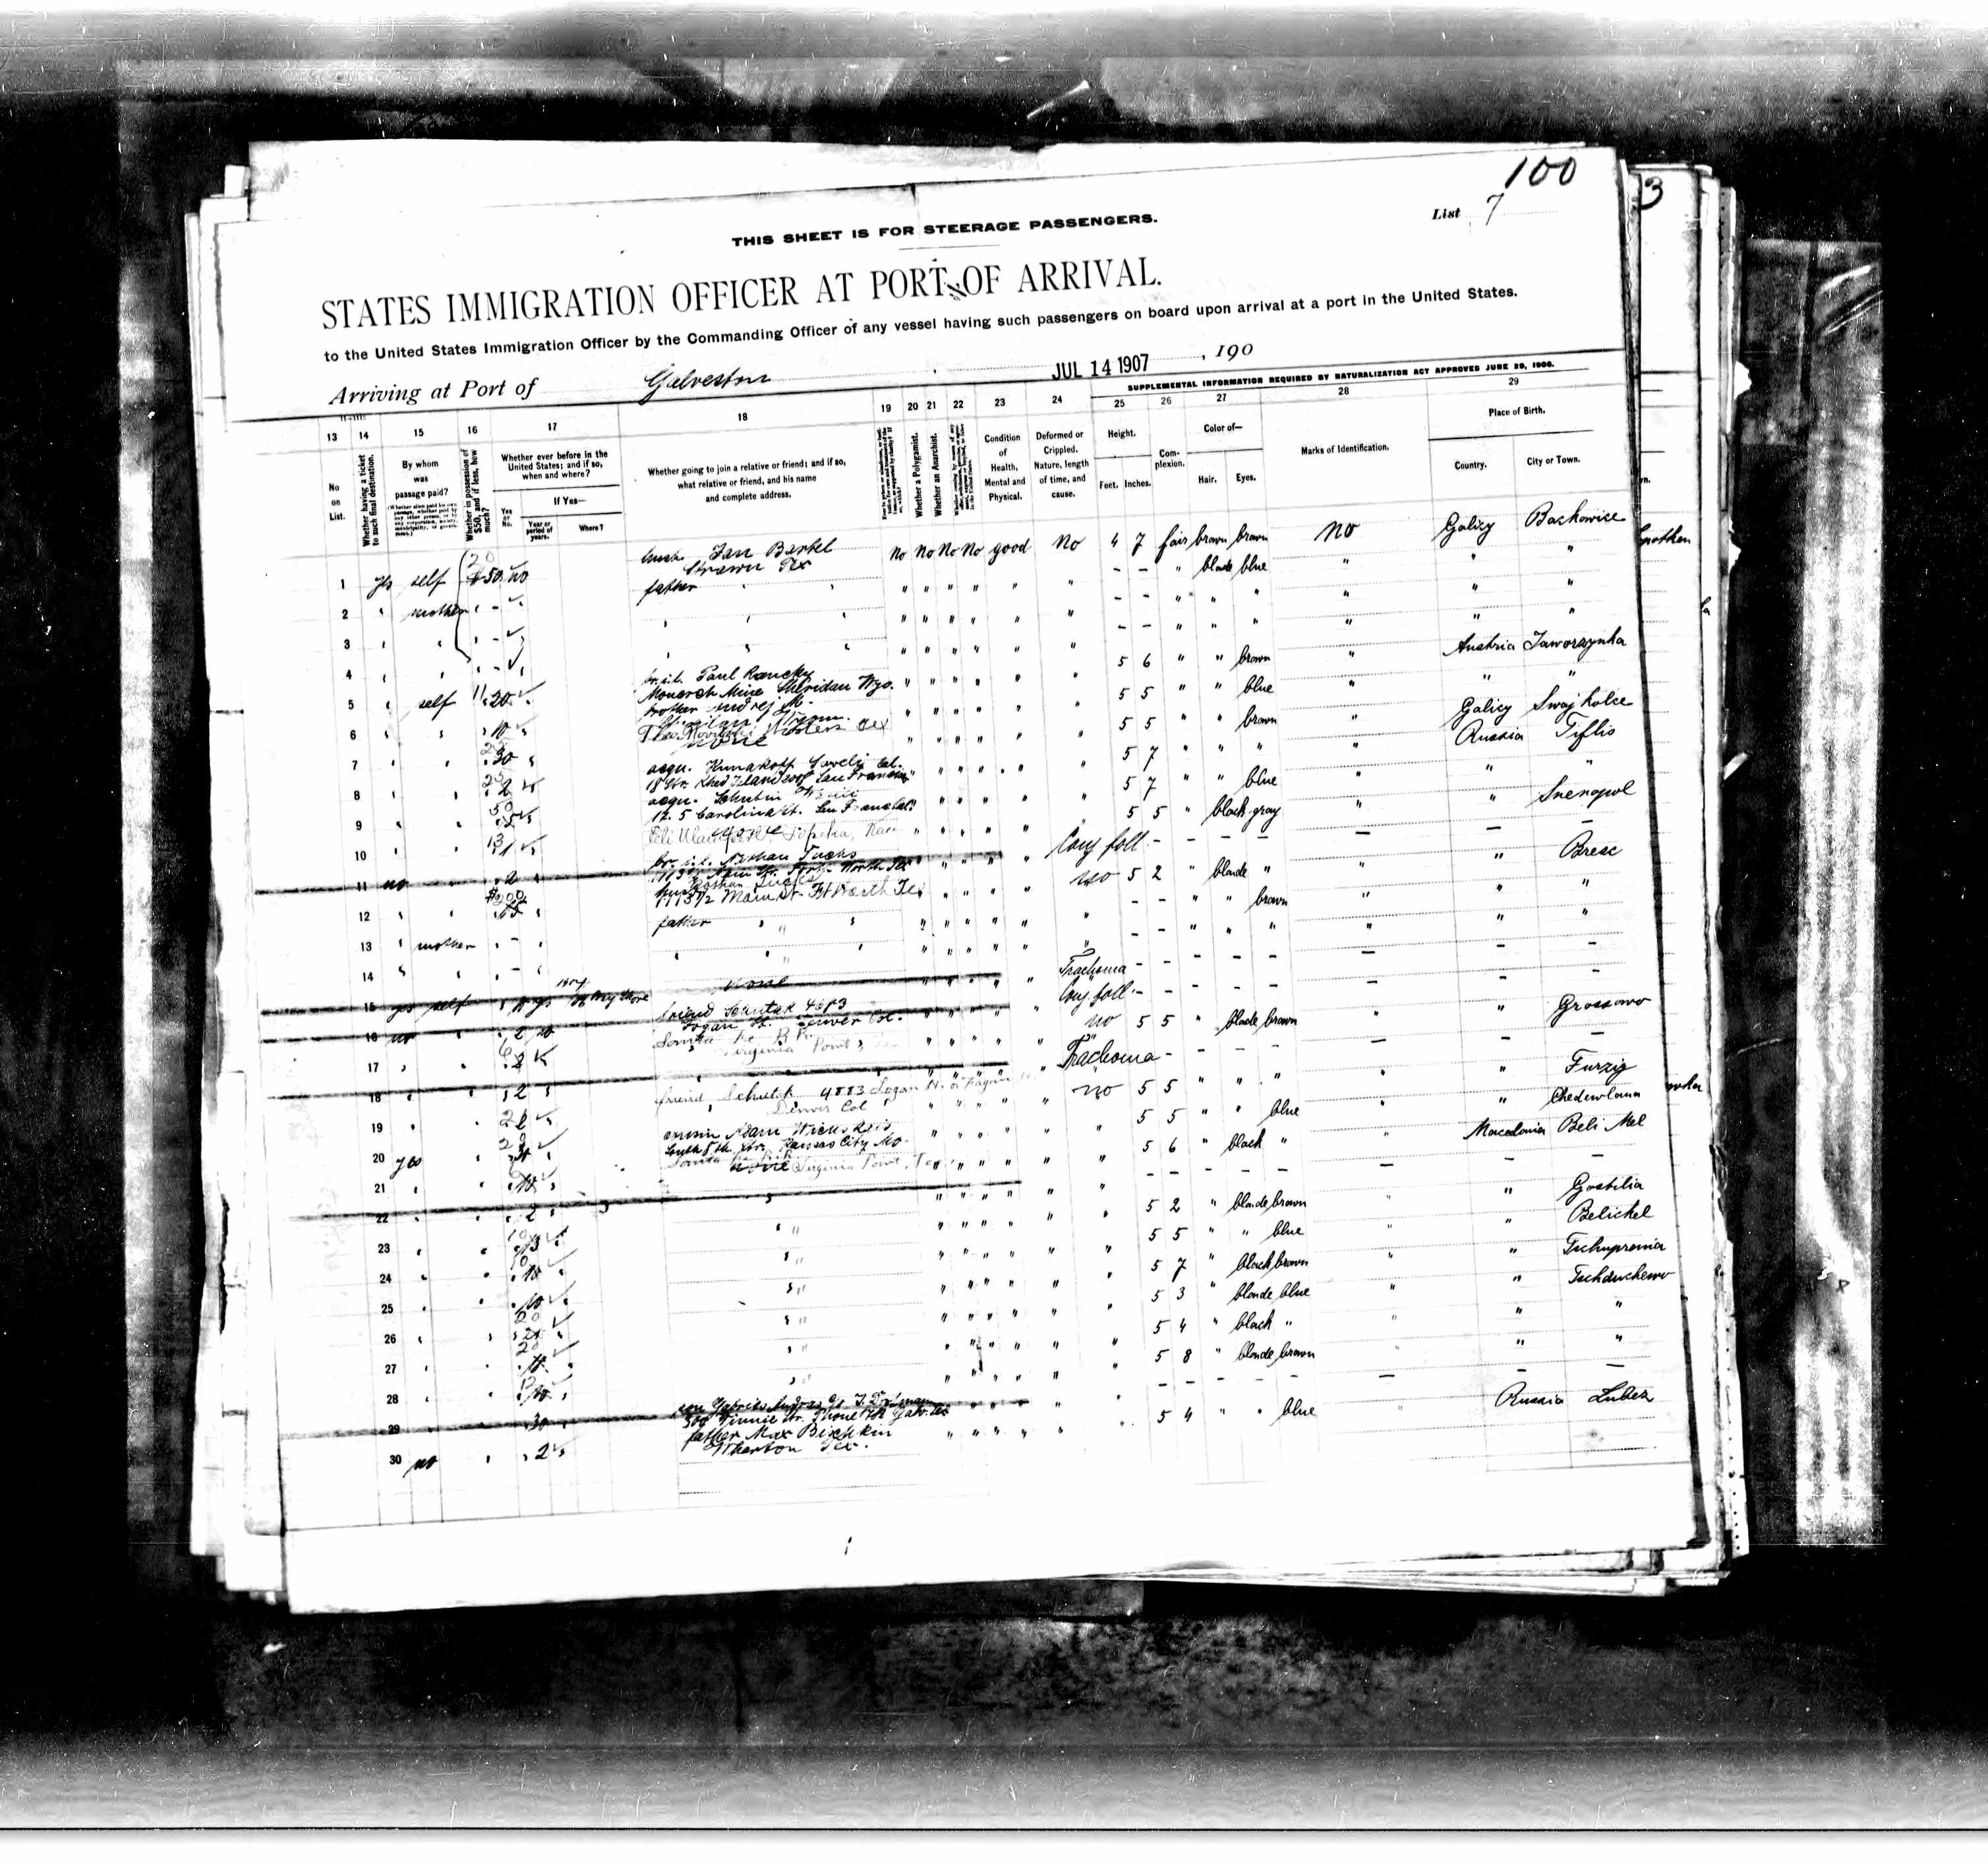 Description arrival month 07 source information ancestry galveston texas description arrival month 07 source information ancestry texas passenger lists aiddatafo Image collections